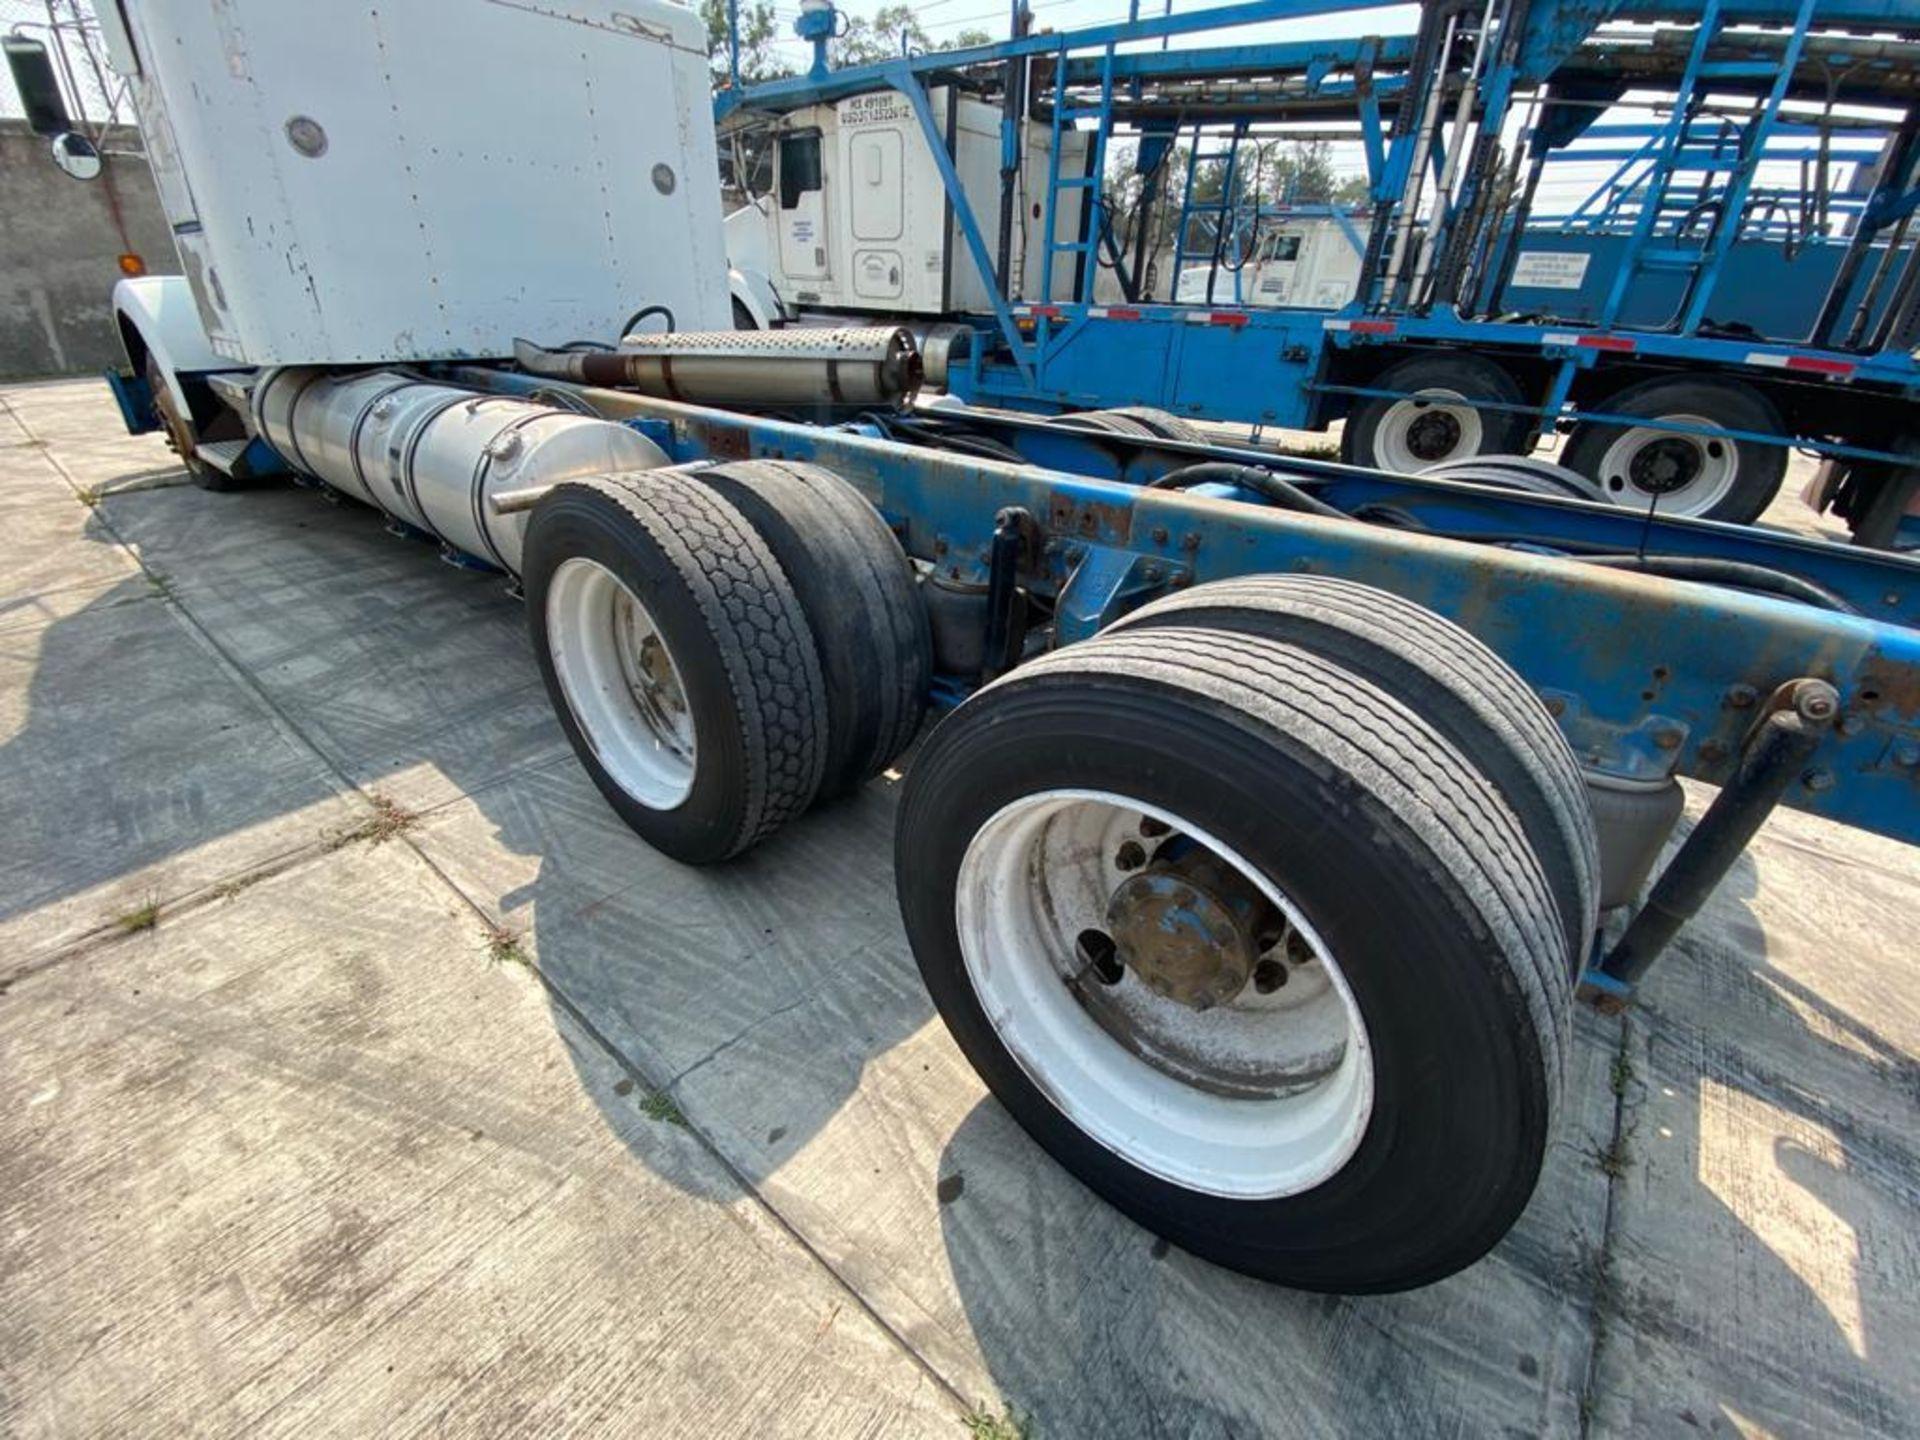 1999 Kenworth Sleeper truck tractor, standard transmission of 18 speeds - Image 15 of 72